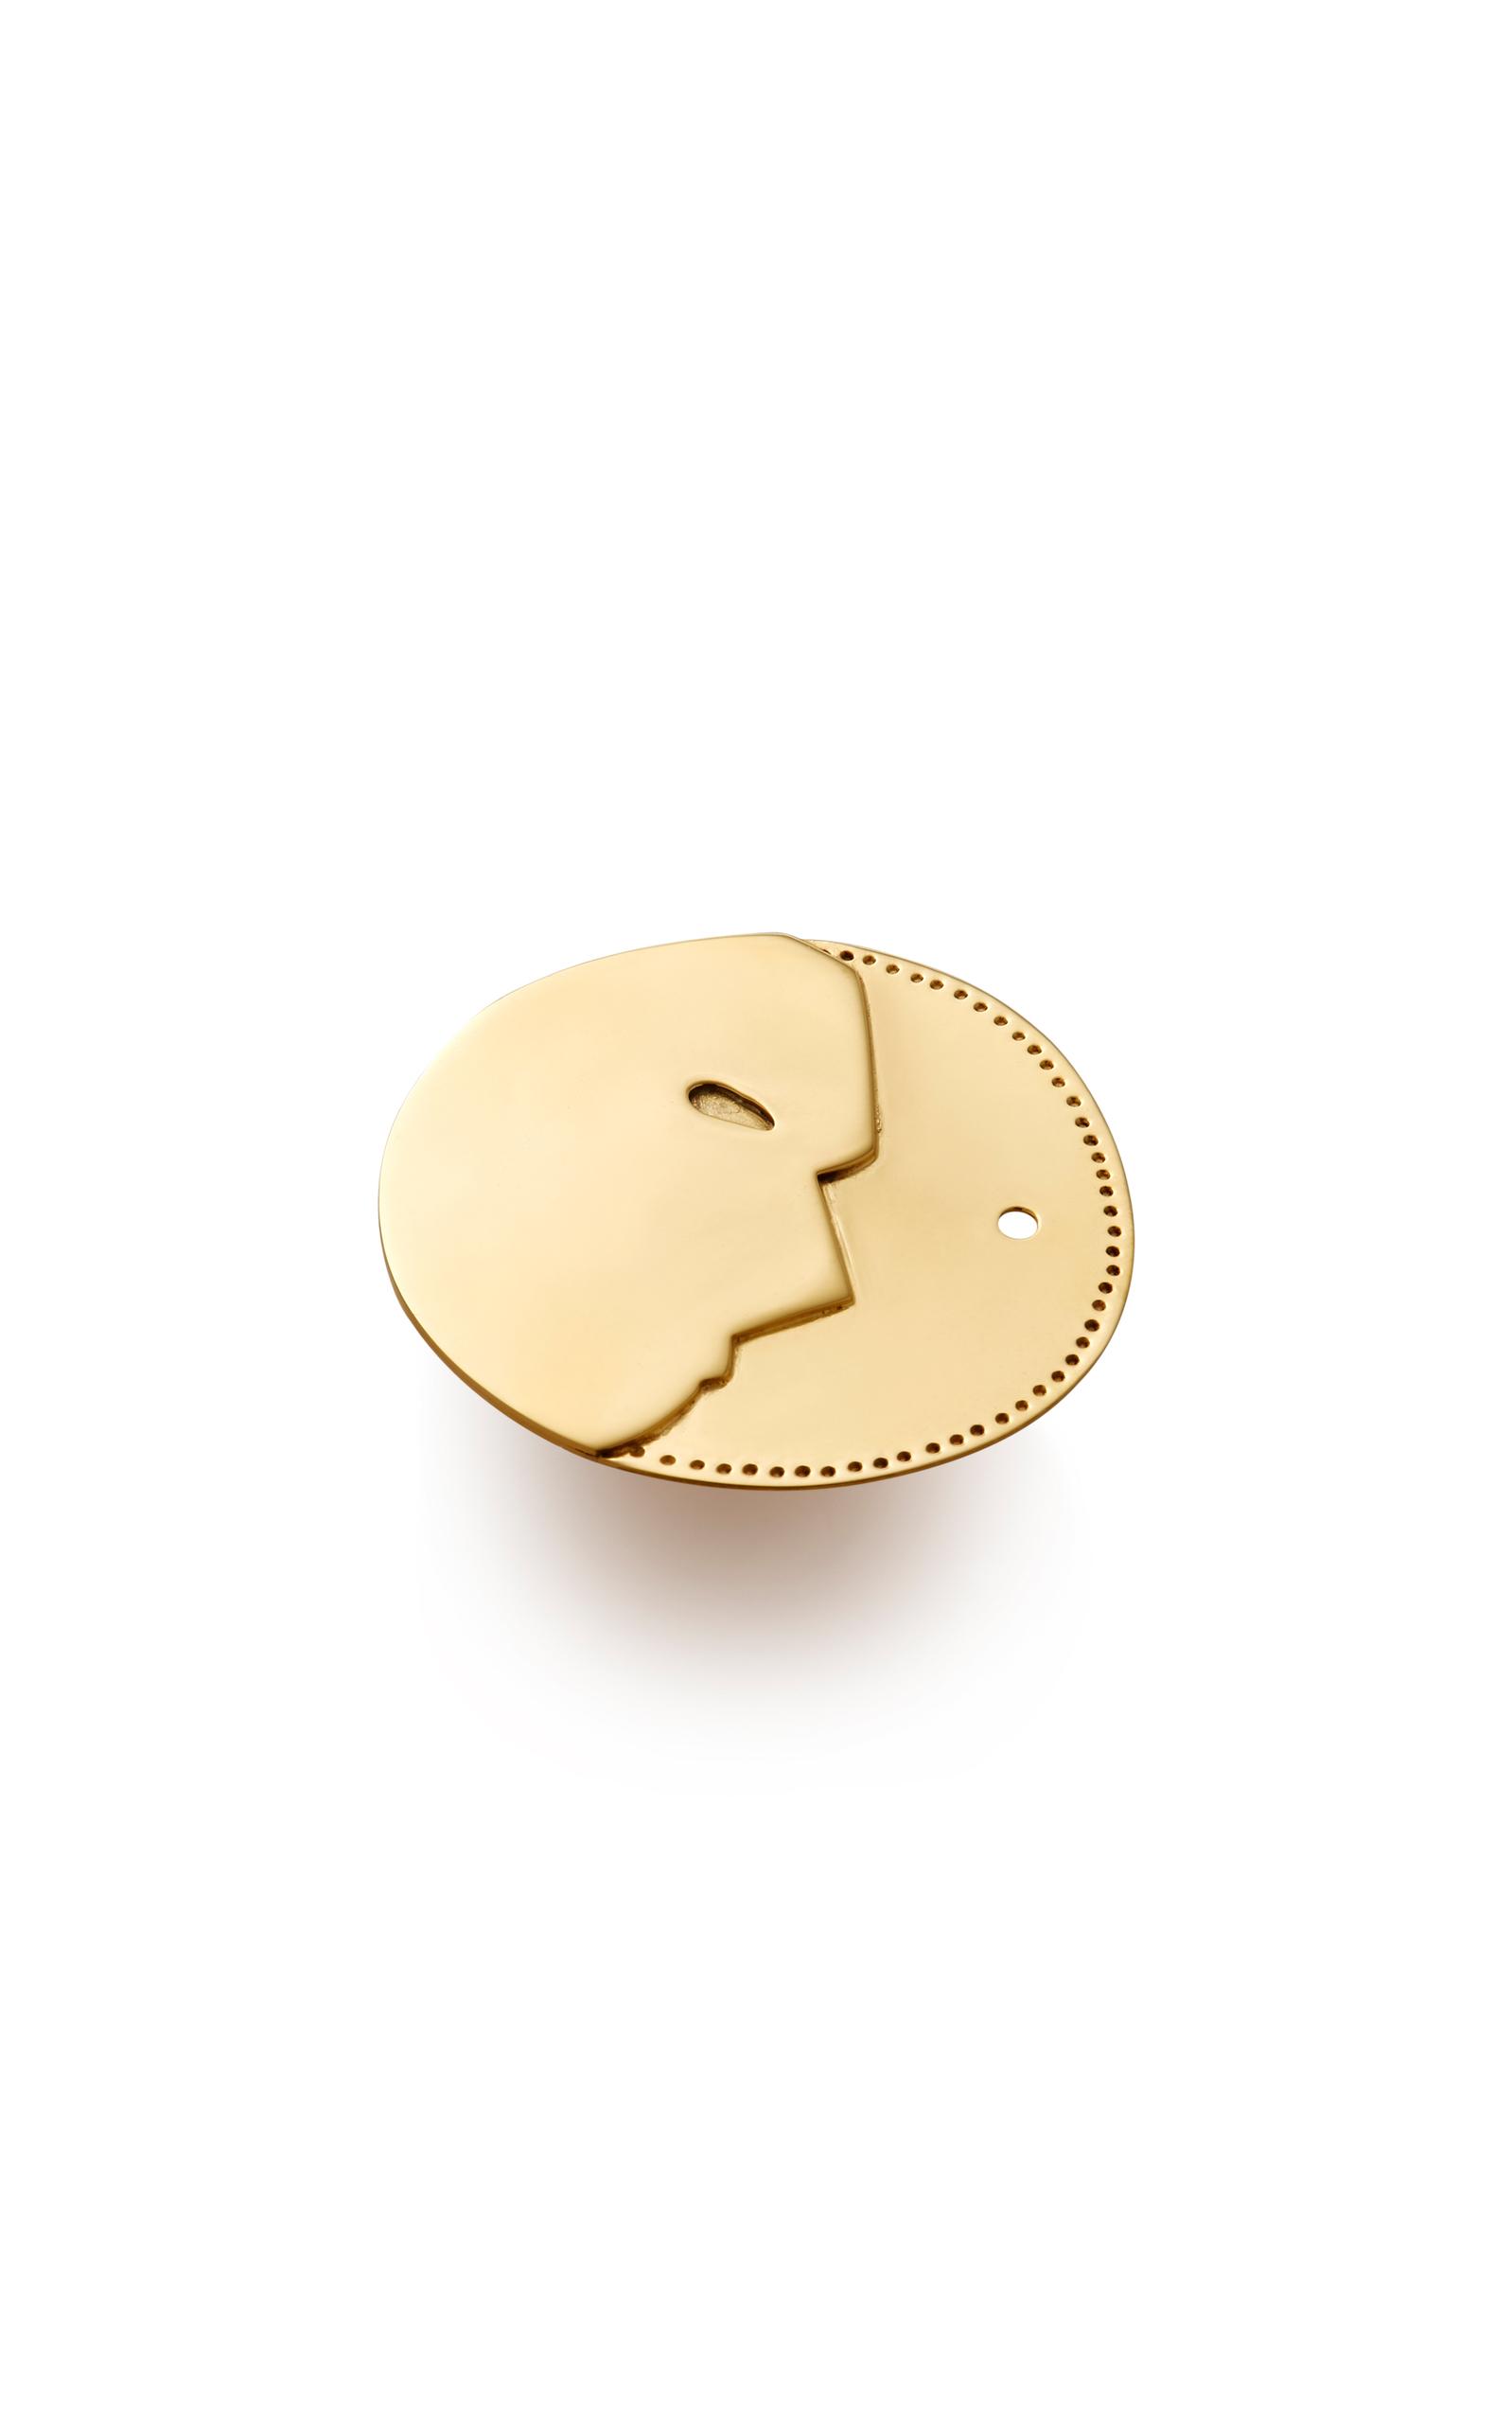 Brass ring madison choice image wedding dress decoration and moda operandi manmoon gold plated brass ring by kalmar full screen junglespirit choice image junglespirit Image collections